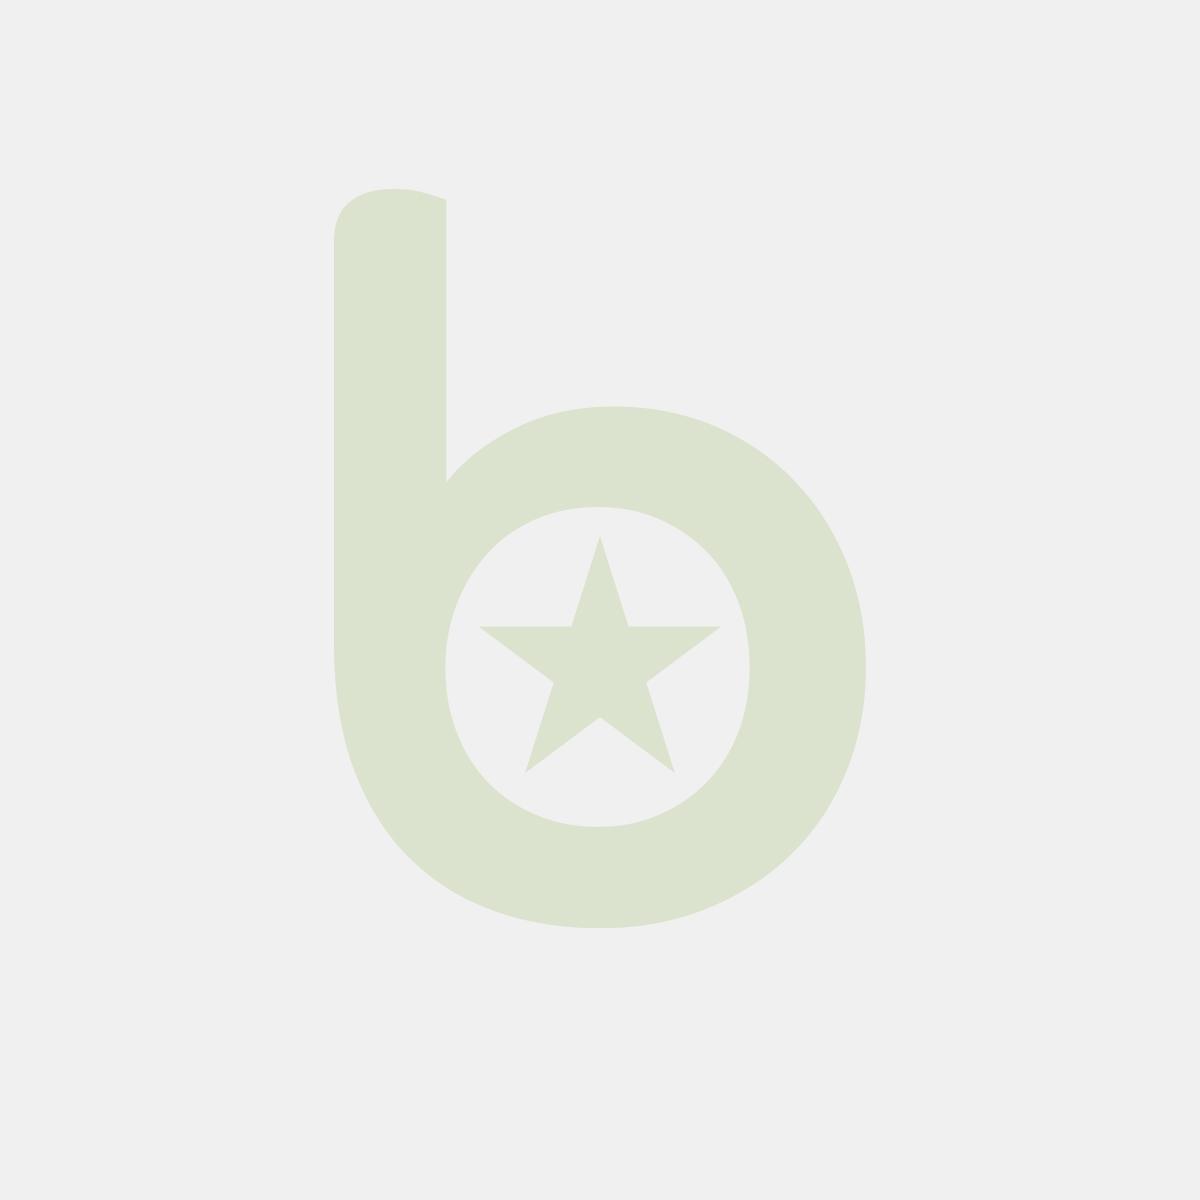 Łyżka do przekąsek FINGERFOOD transparentna , PS, 30szt. w opakowaniu